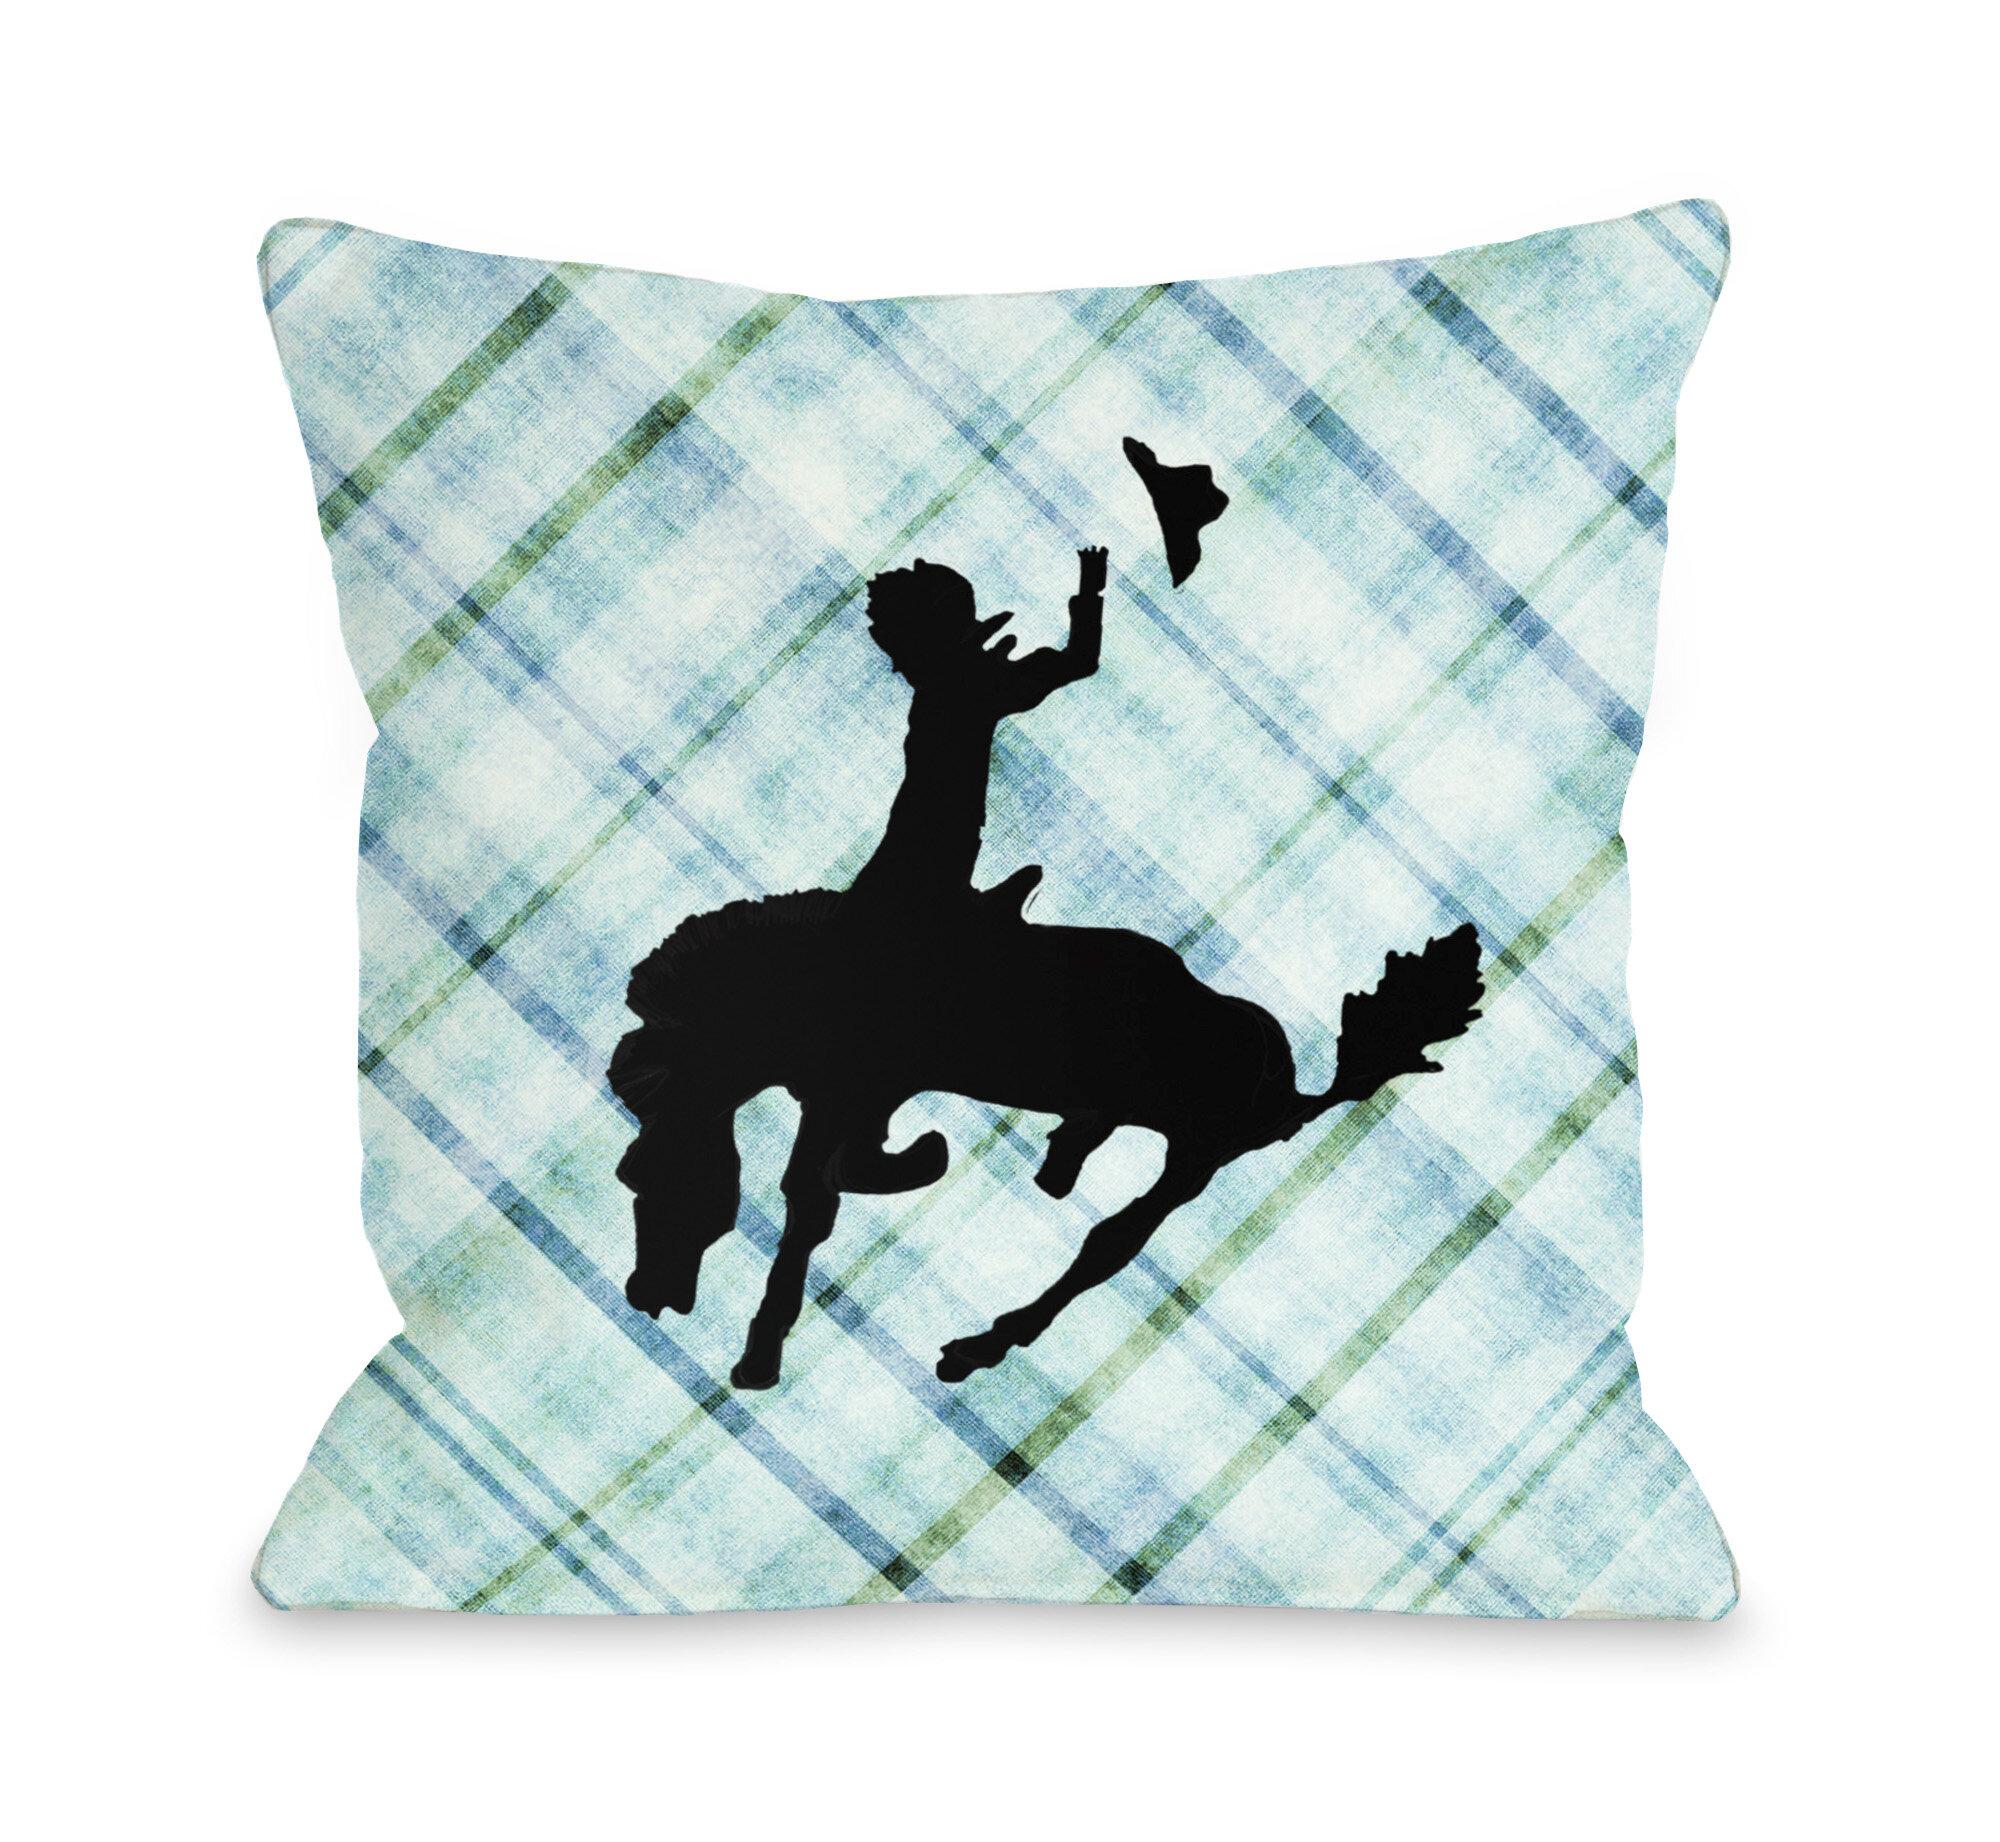 Decorative Pillows Recommendations : One Bella Casa Plaid Cowboy Throw Pillow Wayfair